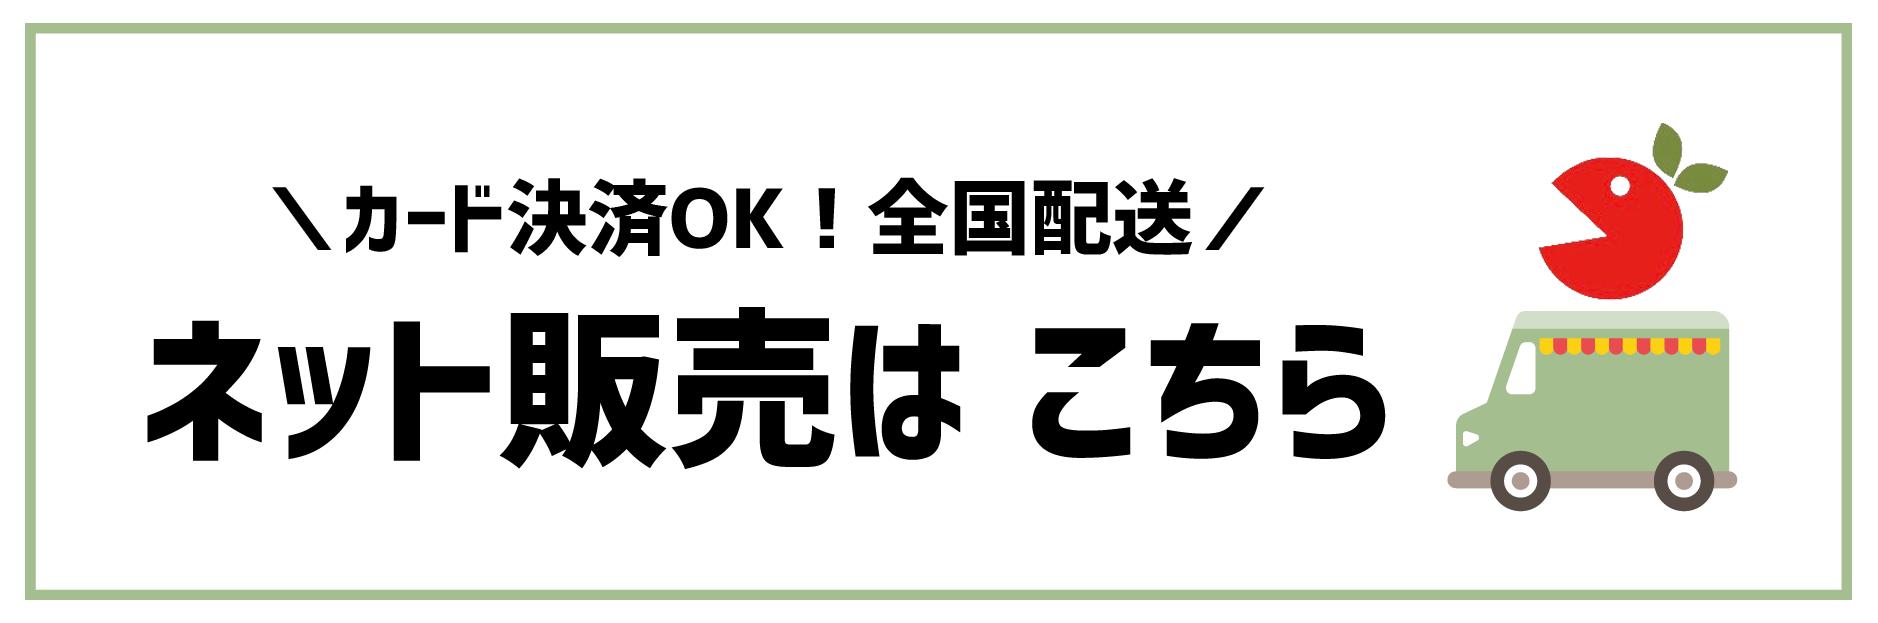 zerofarm _Store